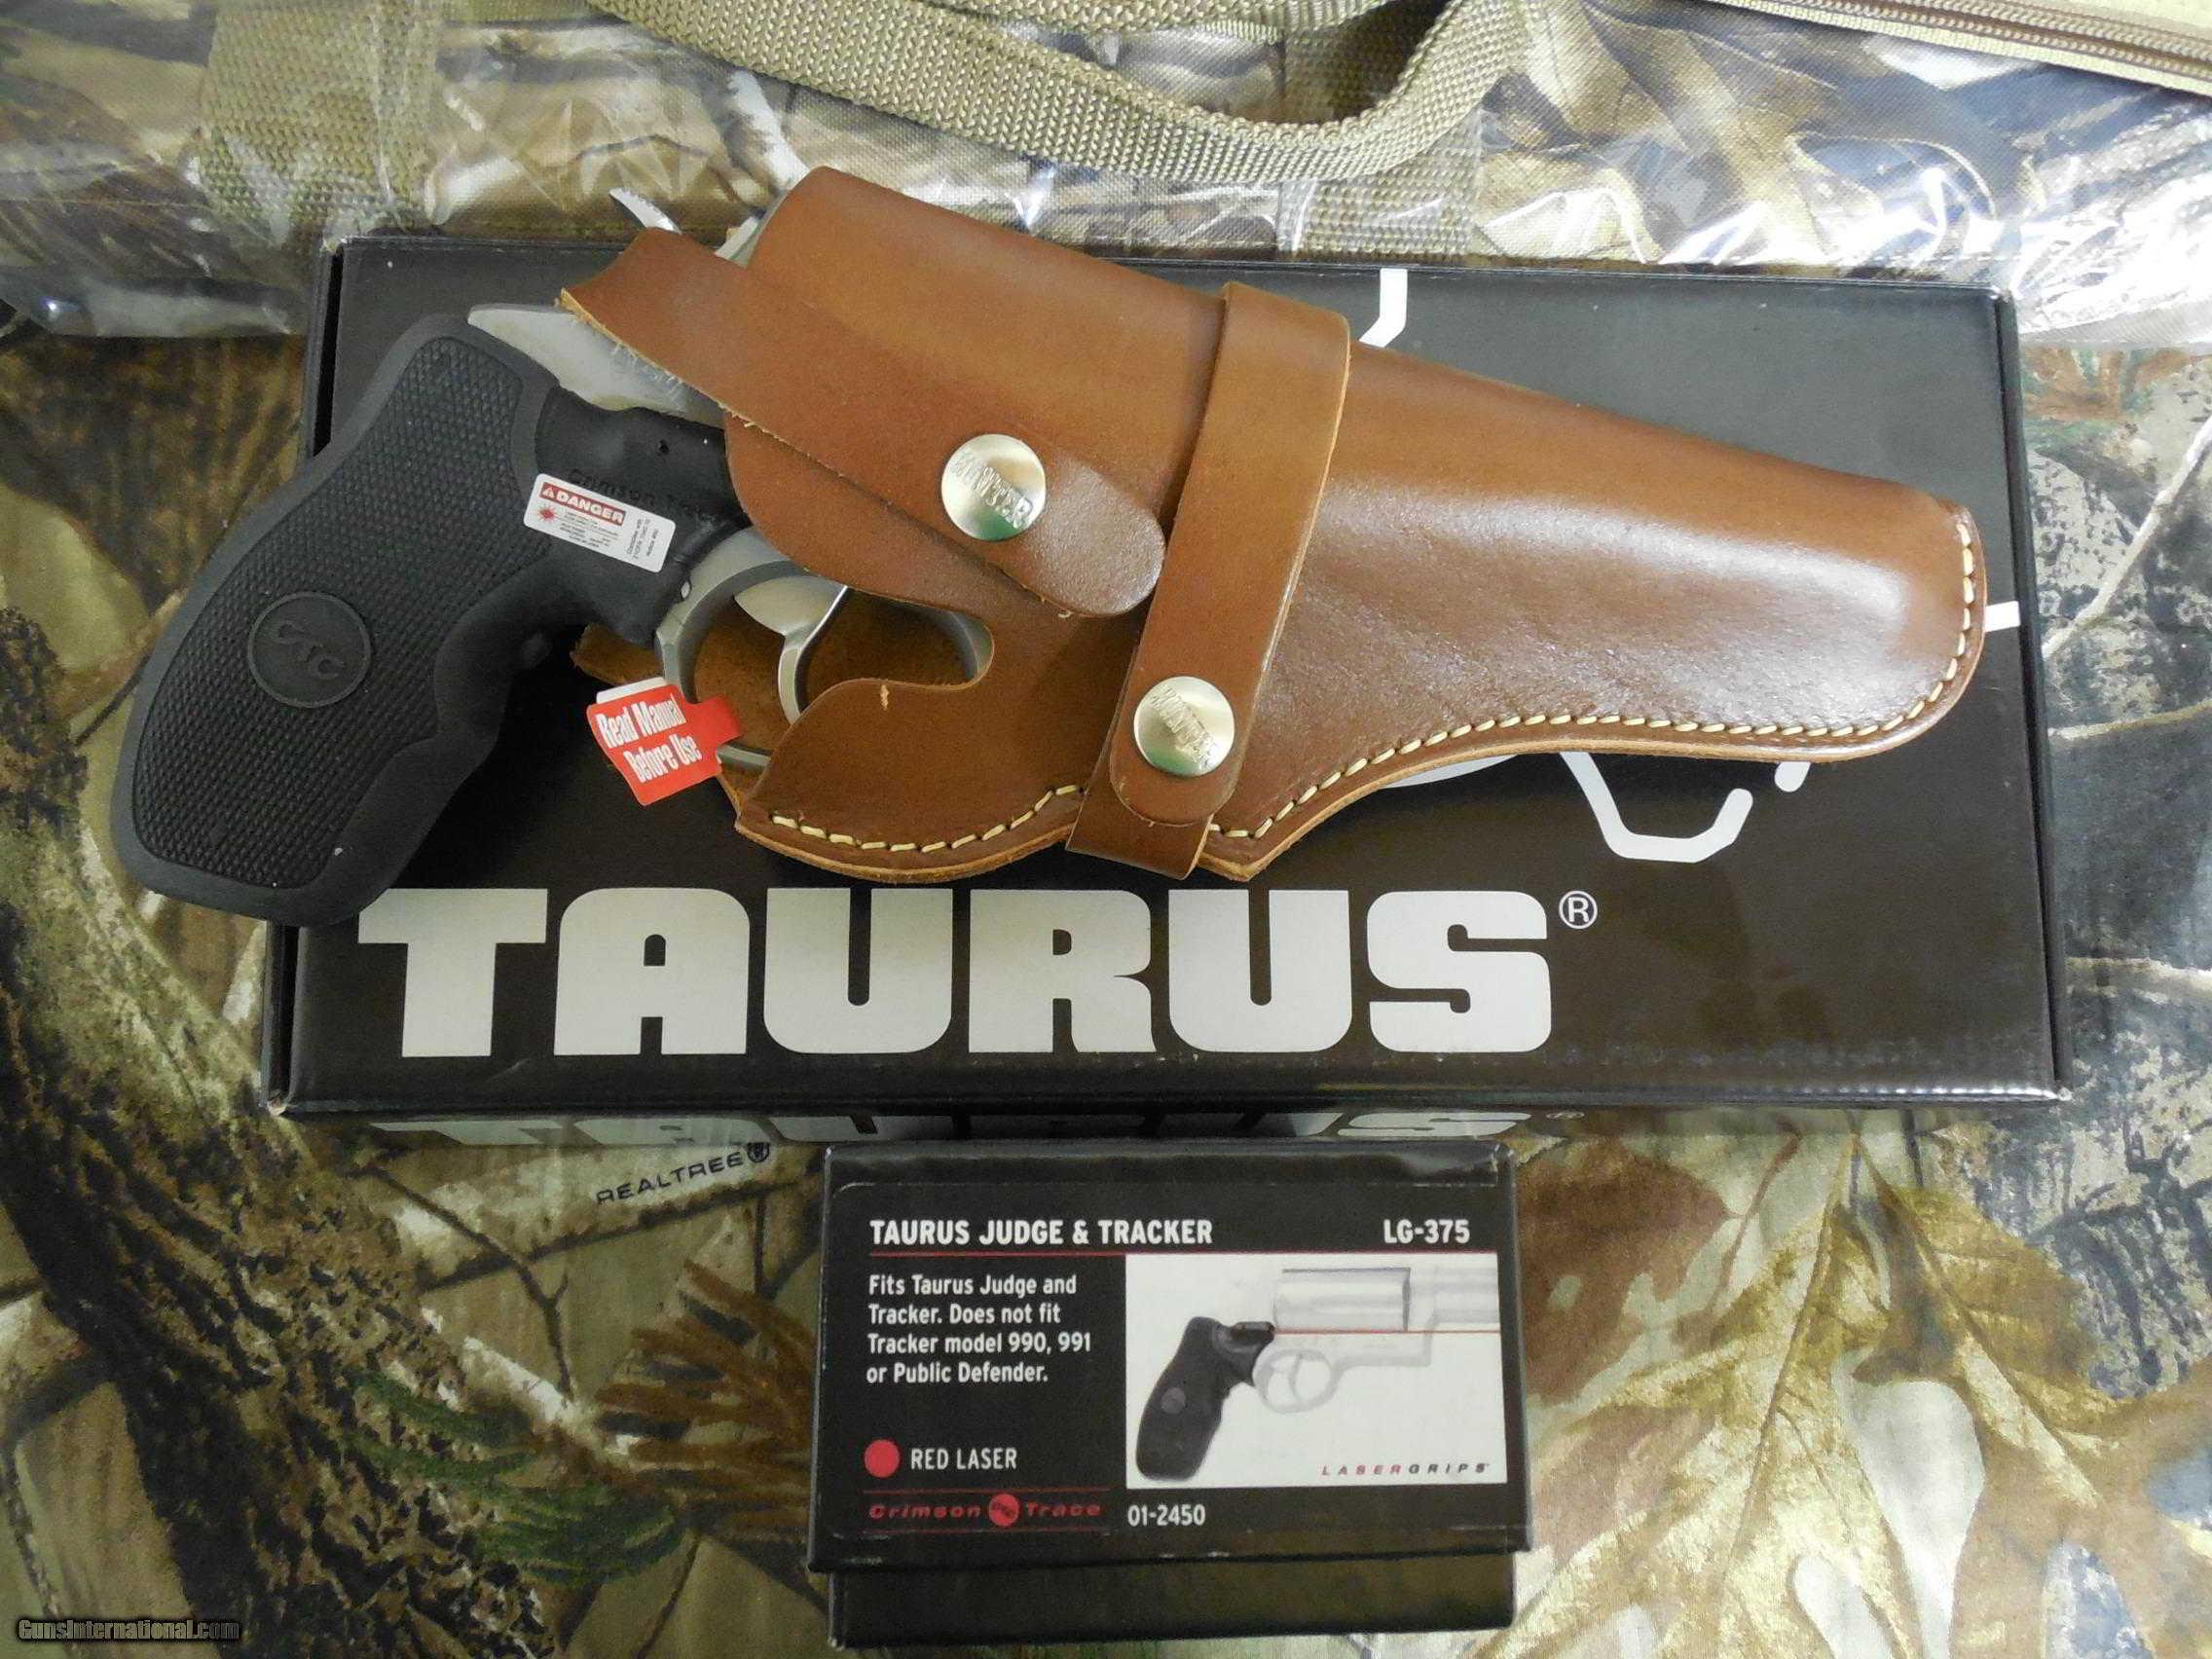 TAURUS JUDGE, STAINLESS STEEL, 45 LONG / 410, 3 0